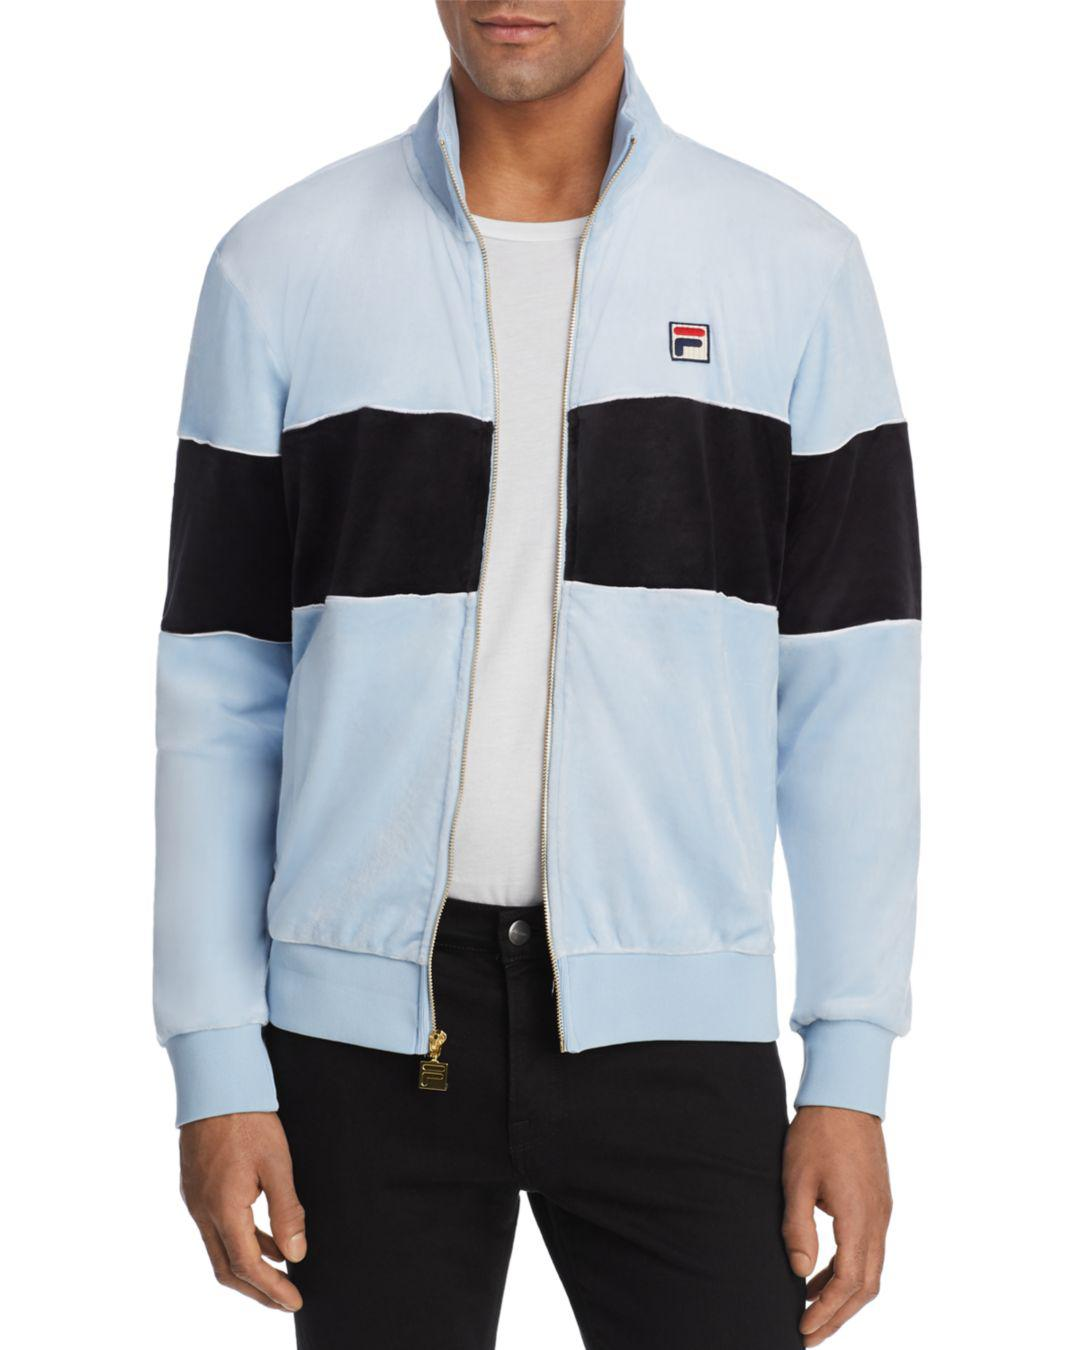 037fd3855ac5 Fila Rocco Color-block Velour Jacket for Men - Lyst